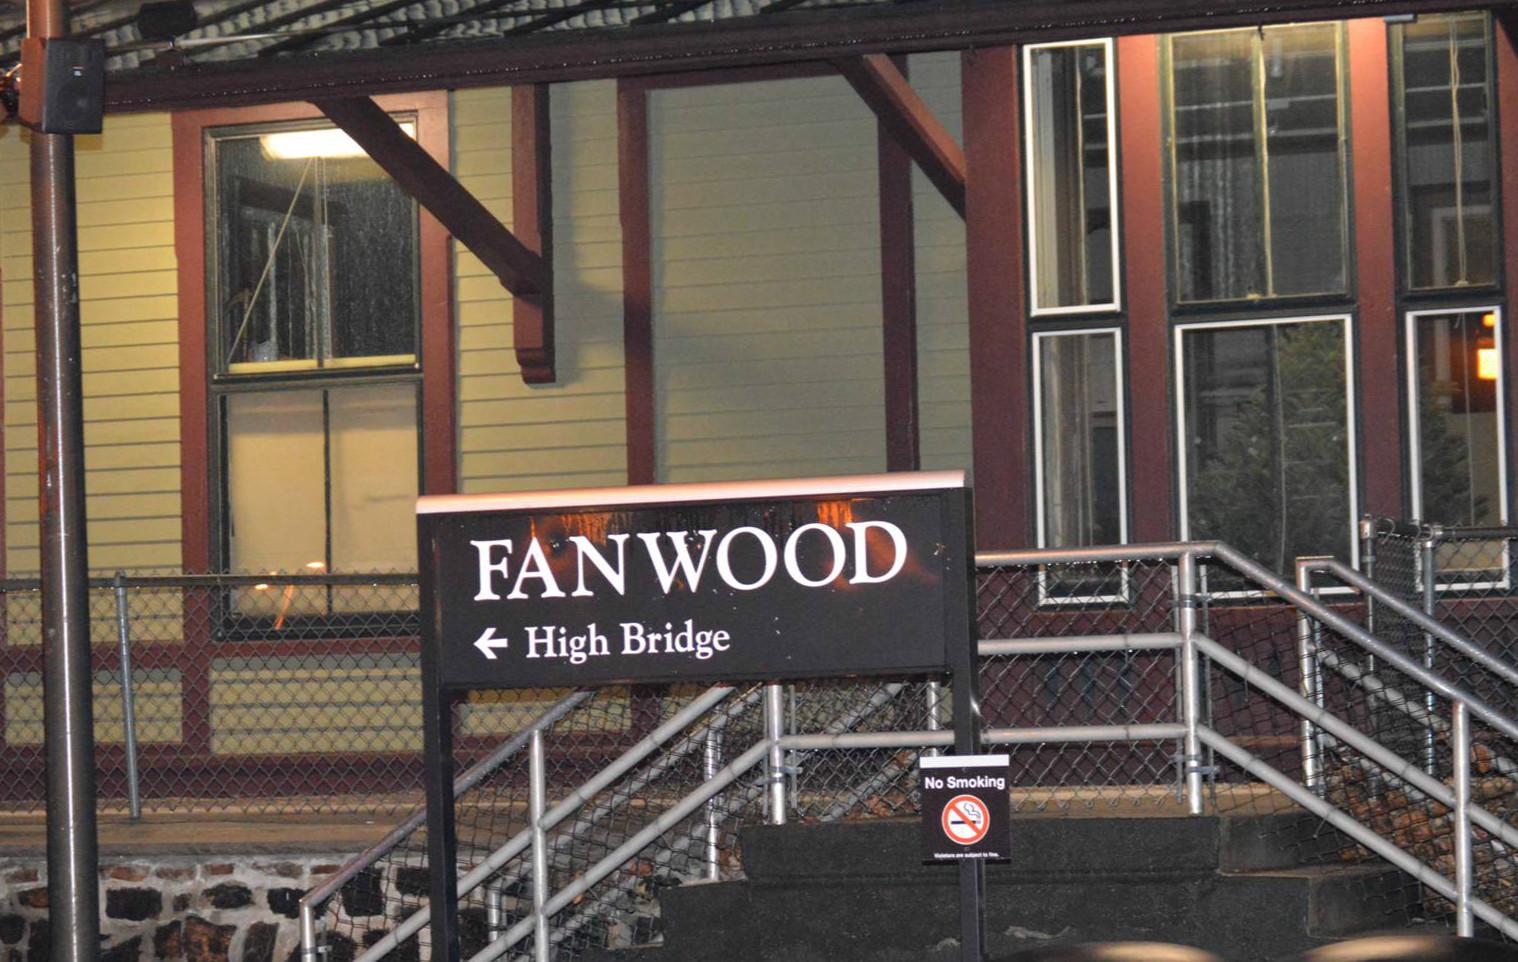 de35dca8fff73ed82d4b_Fanwood_station_night.jpg